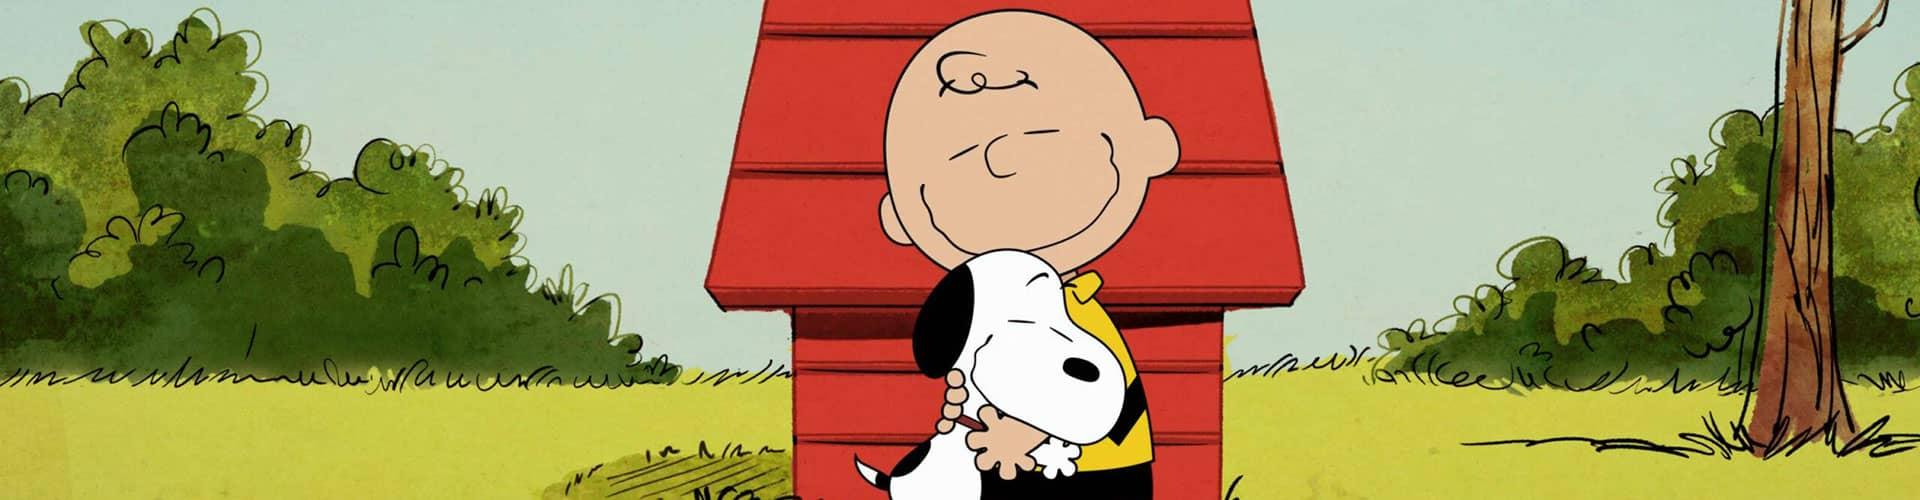 Snoopy i jego Show